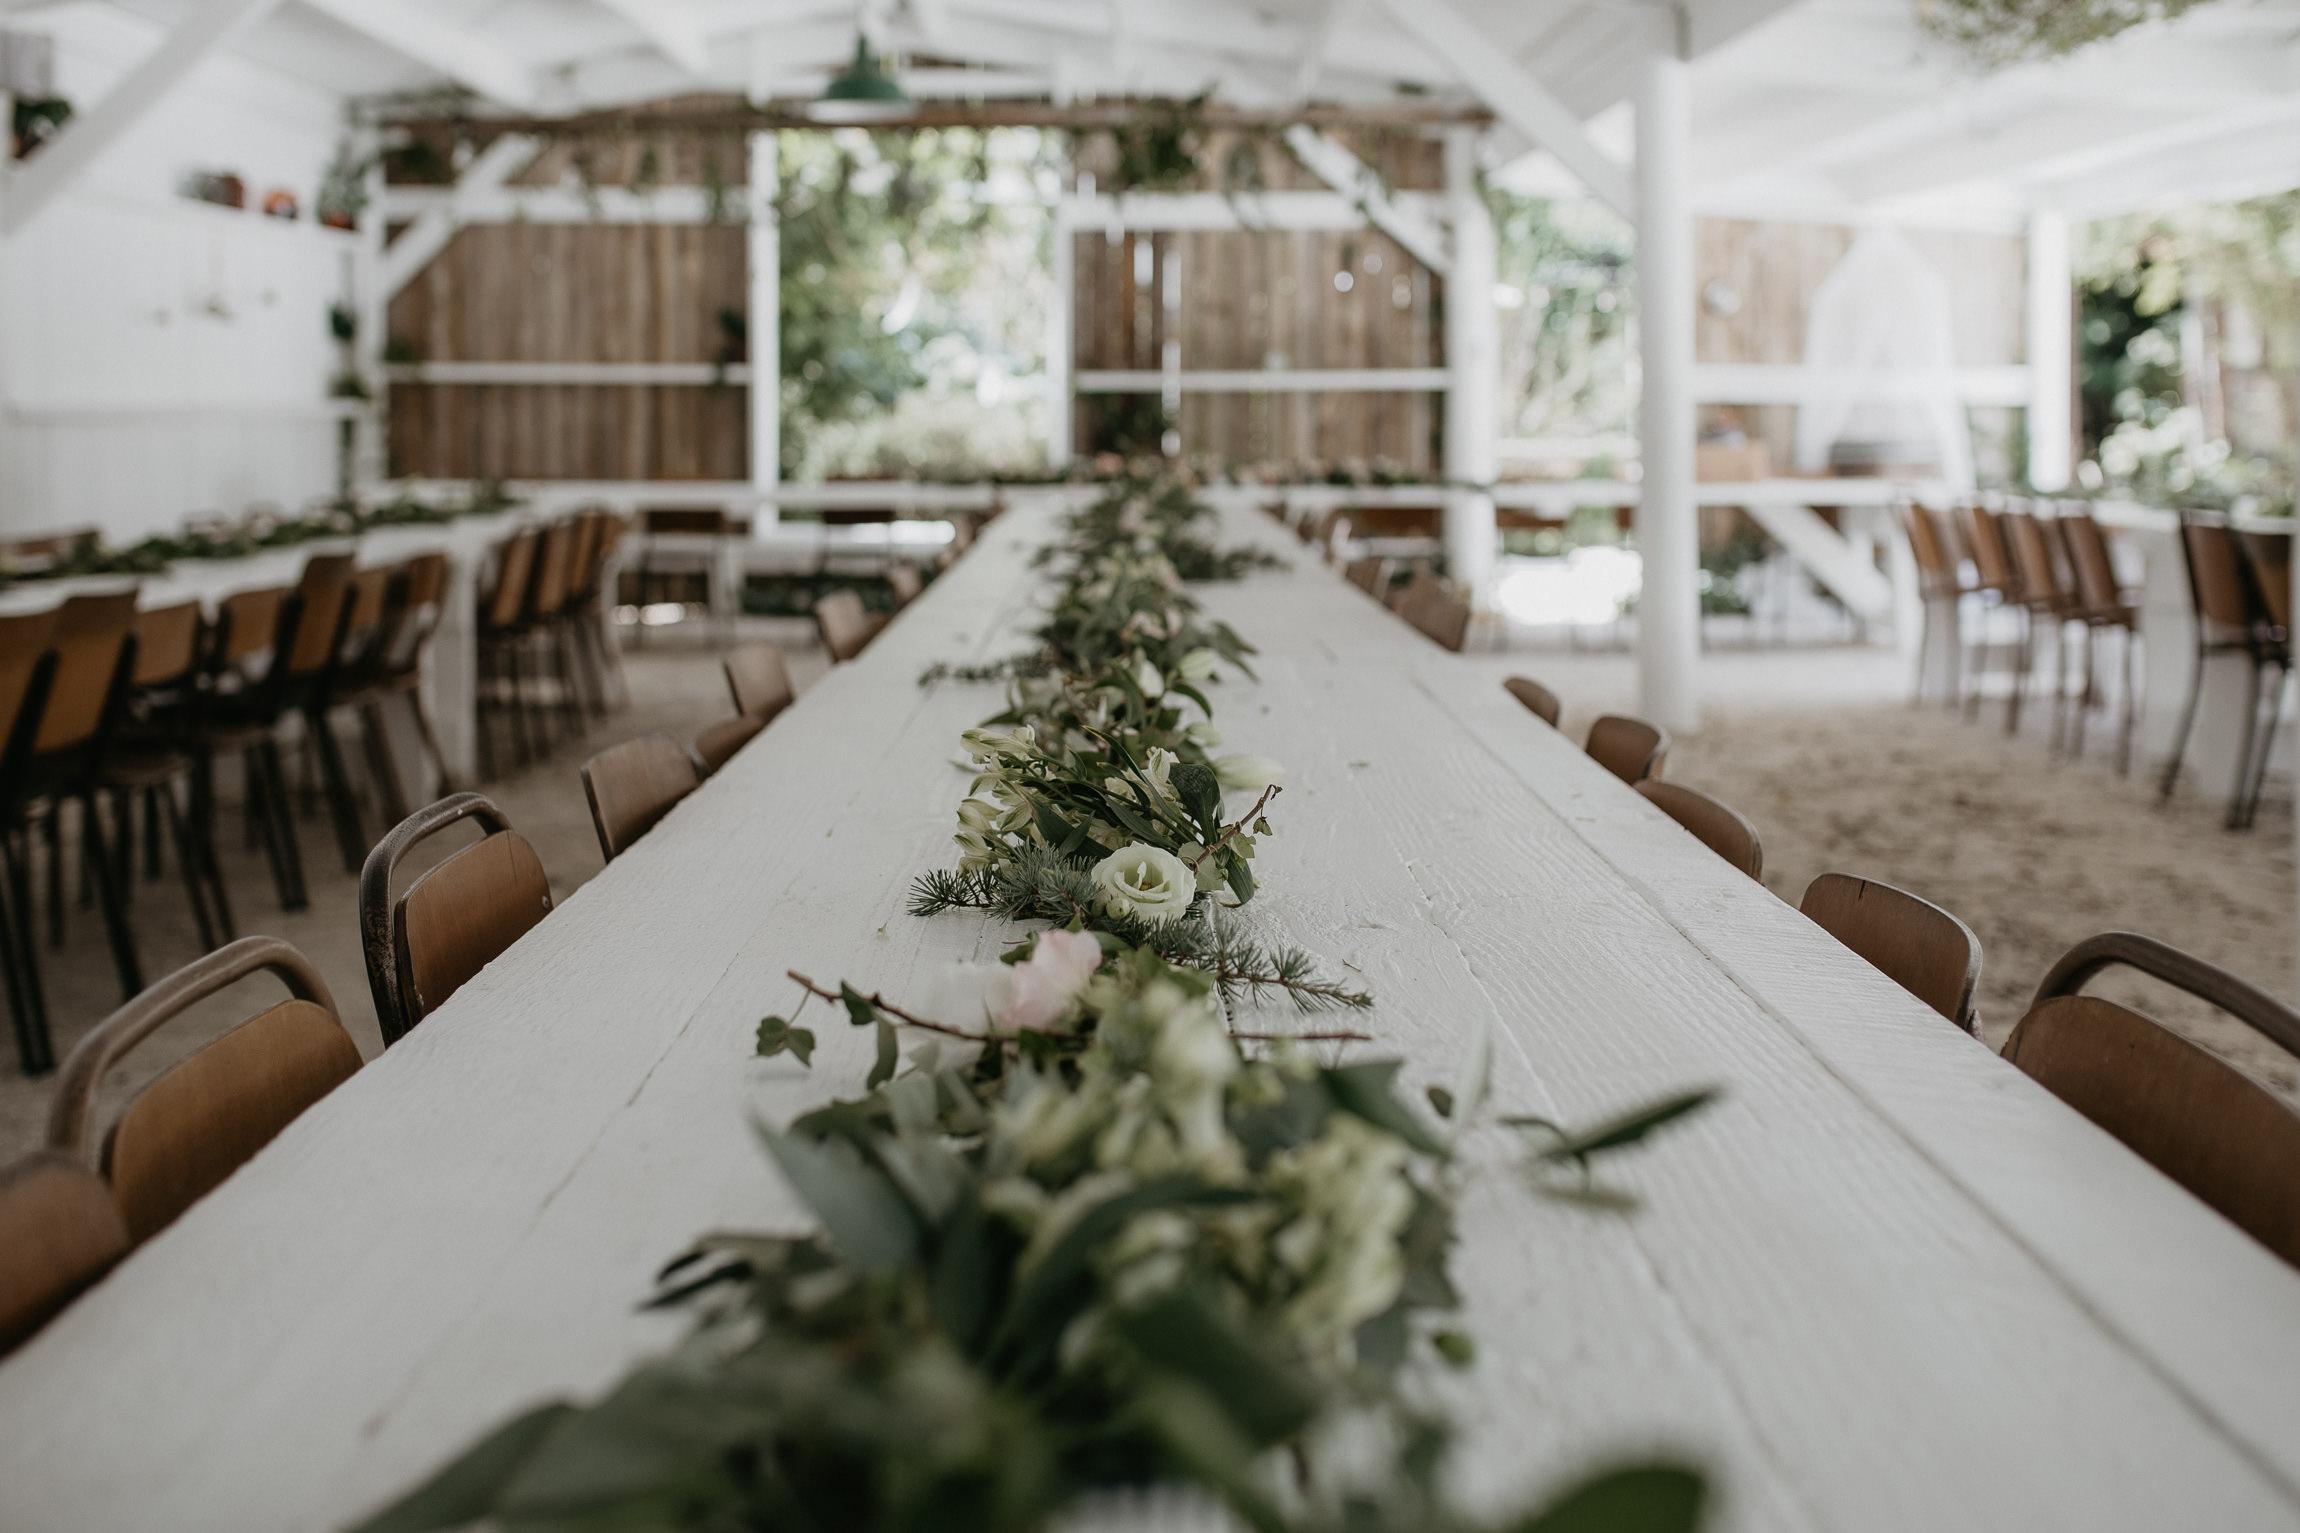 oldforestschool-wedding-blog-44.jpg